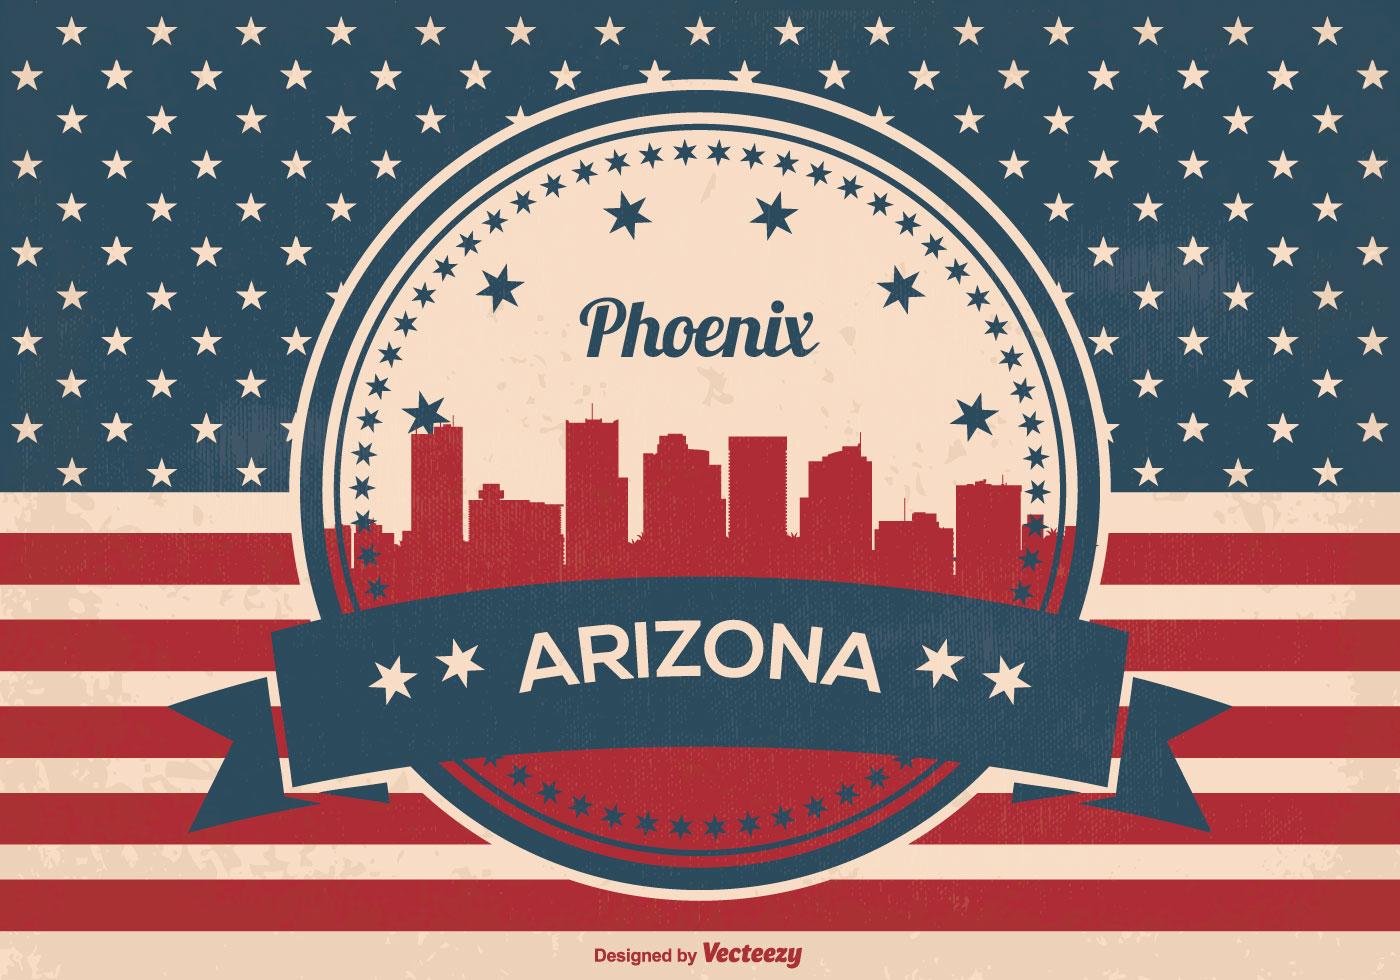 Retro Style Phoenix Arizona Skyline Illustration